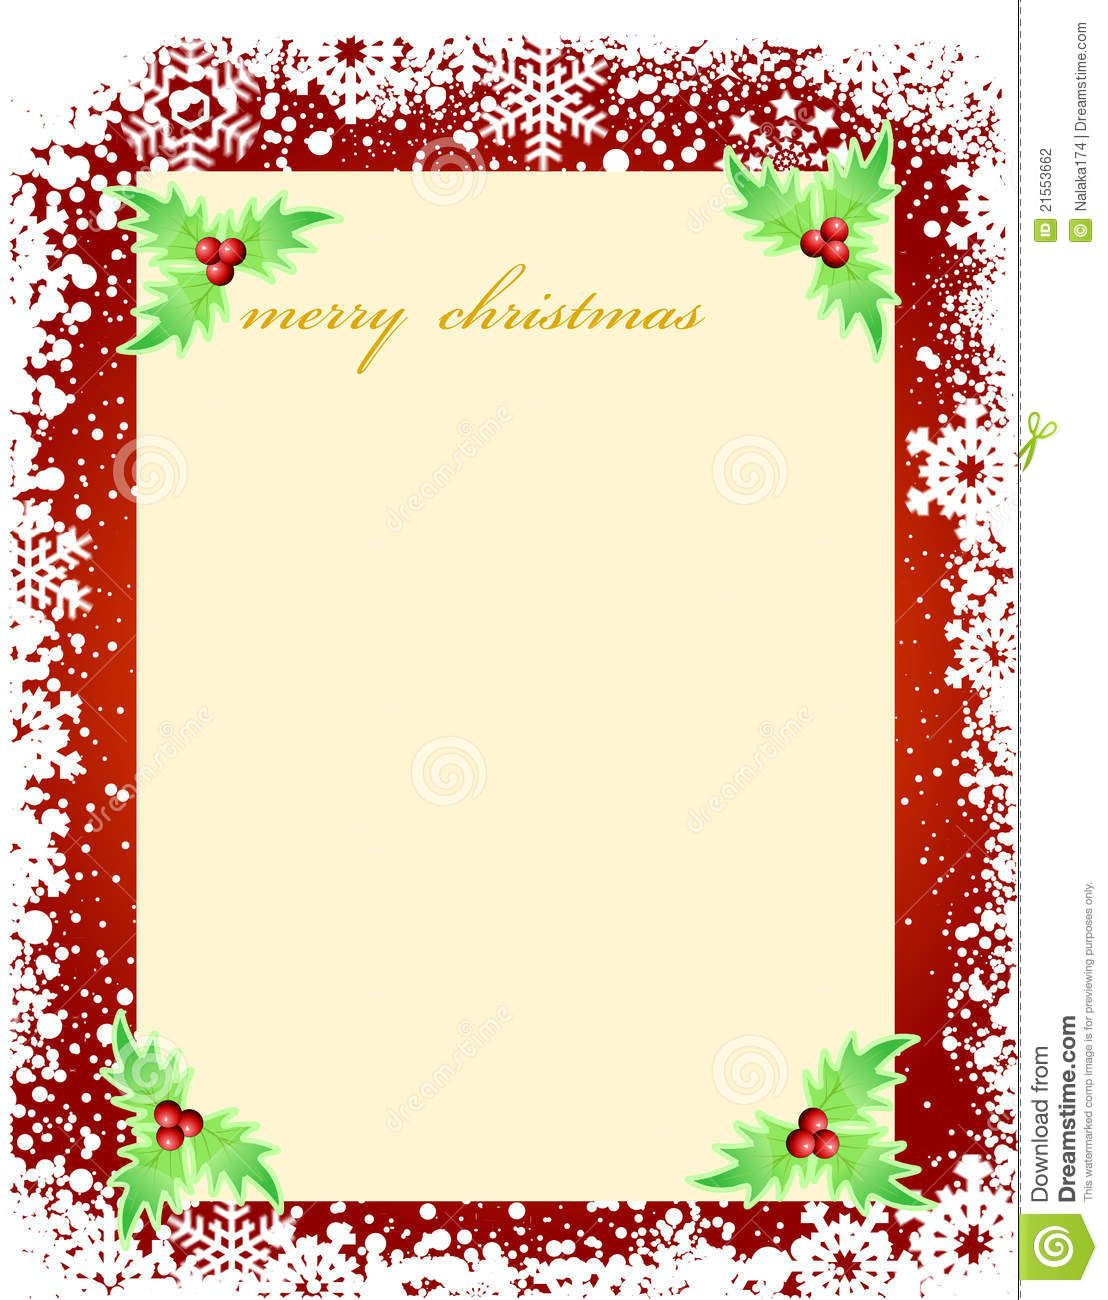 Free Blank Christmas Card Templates Christmas card